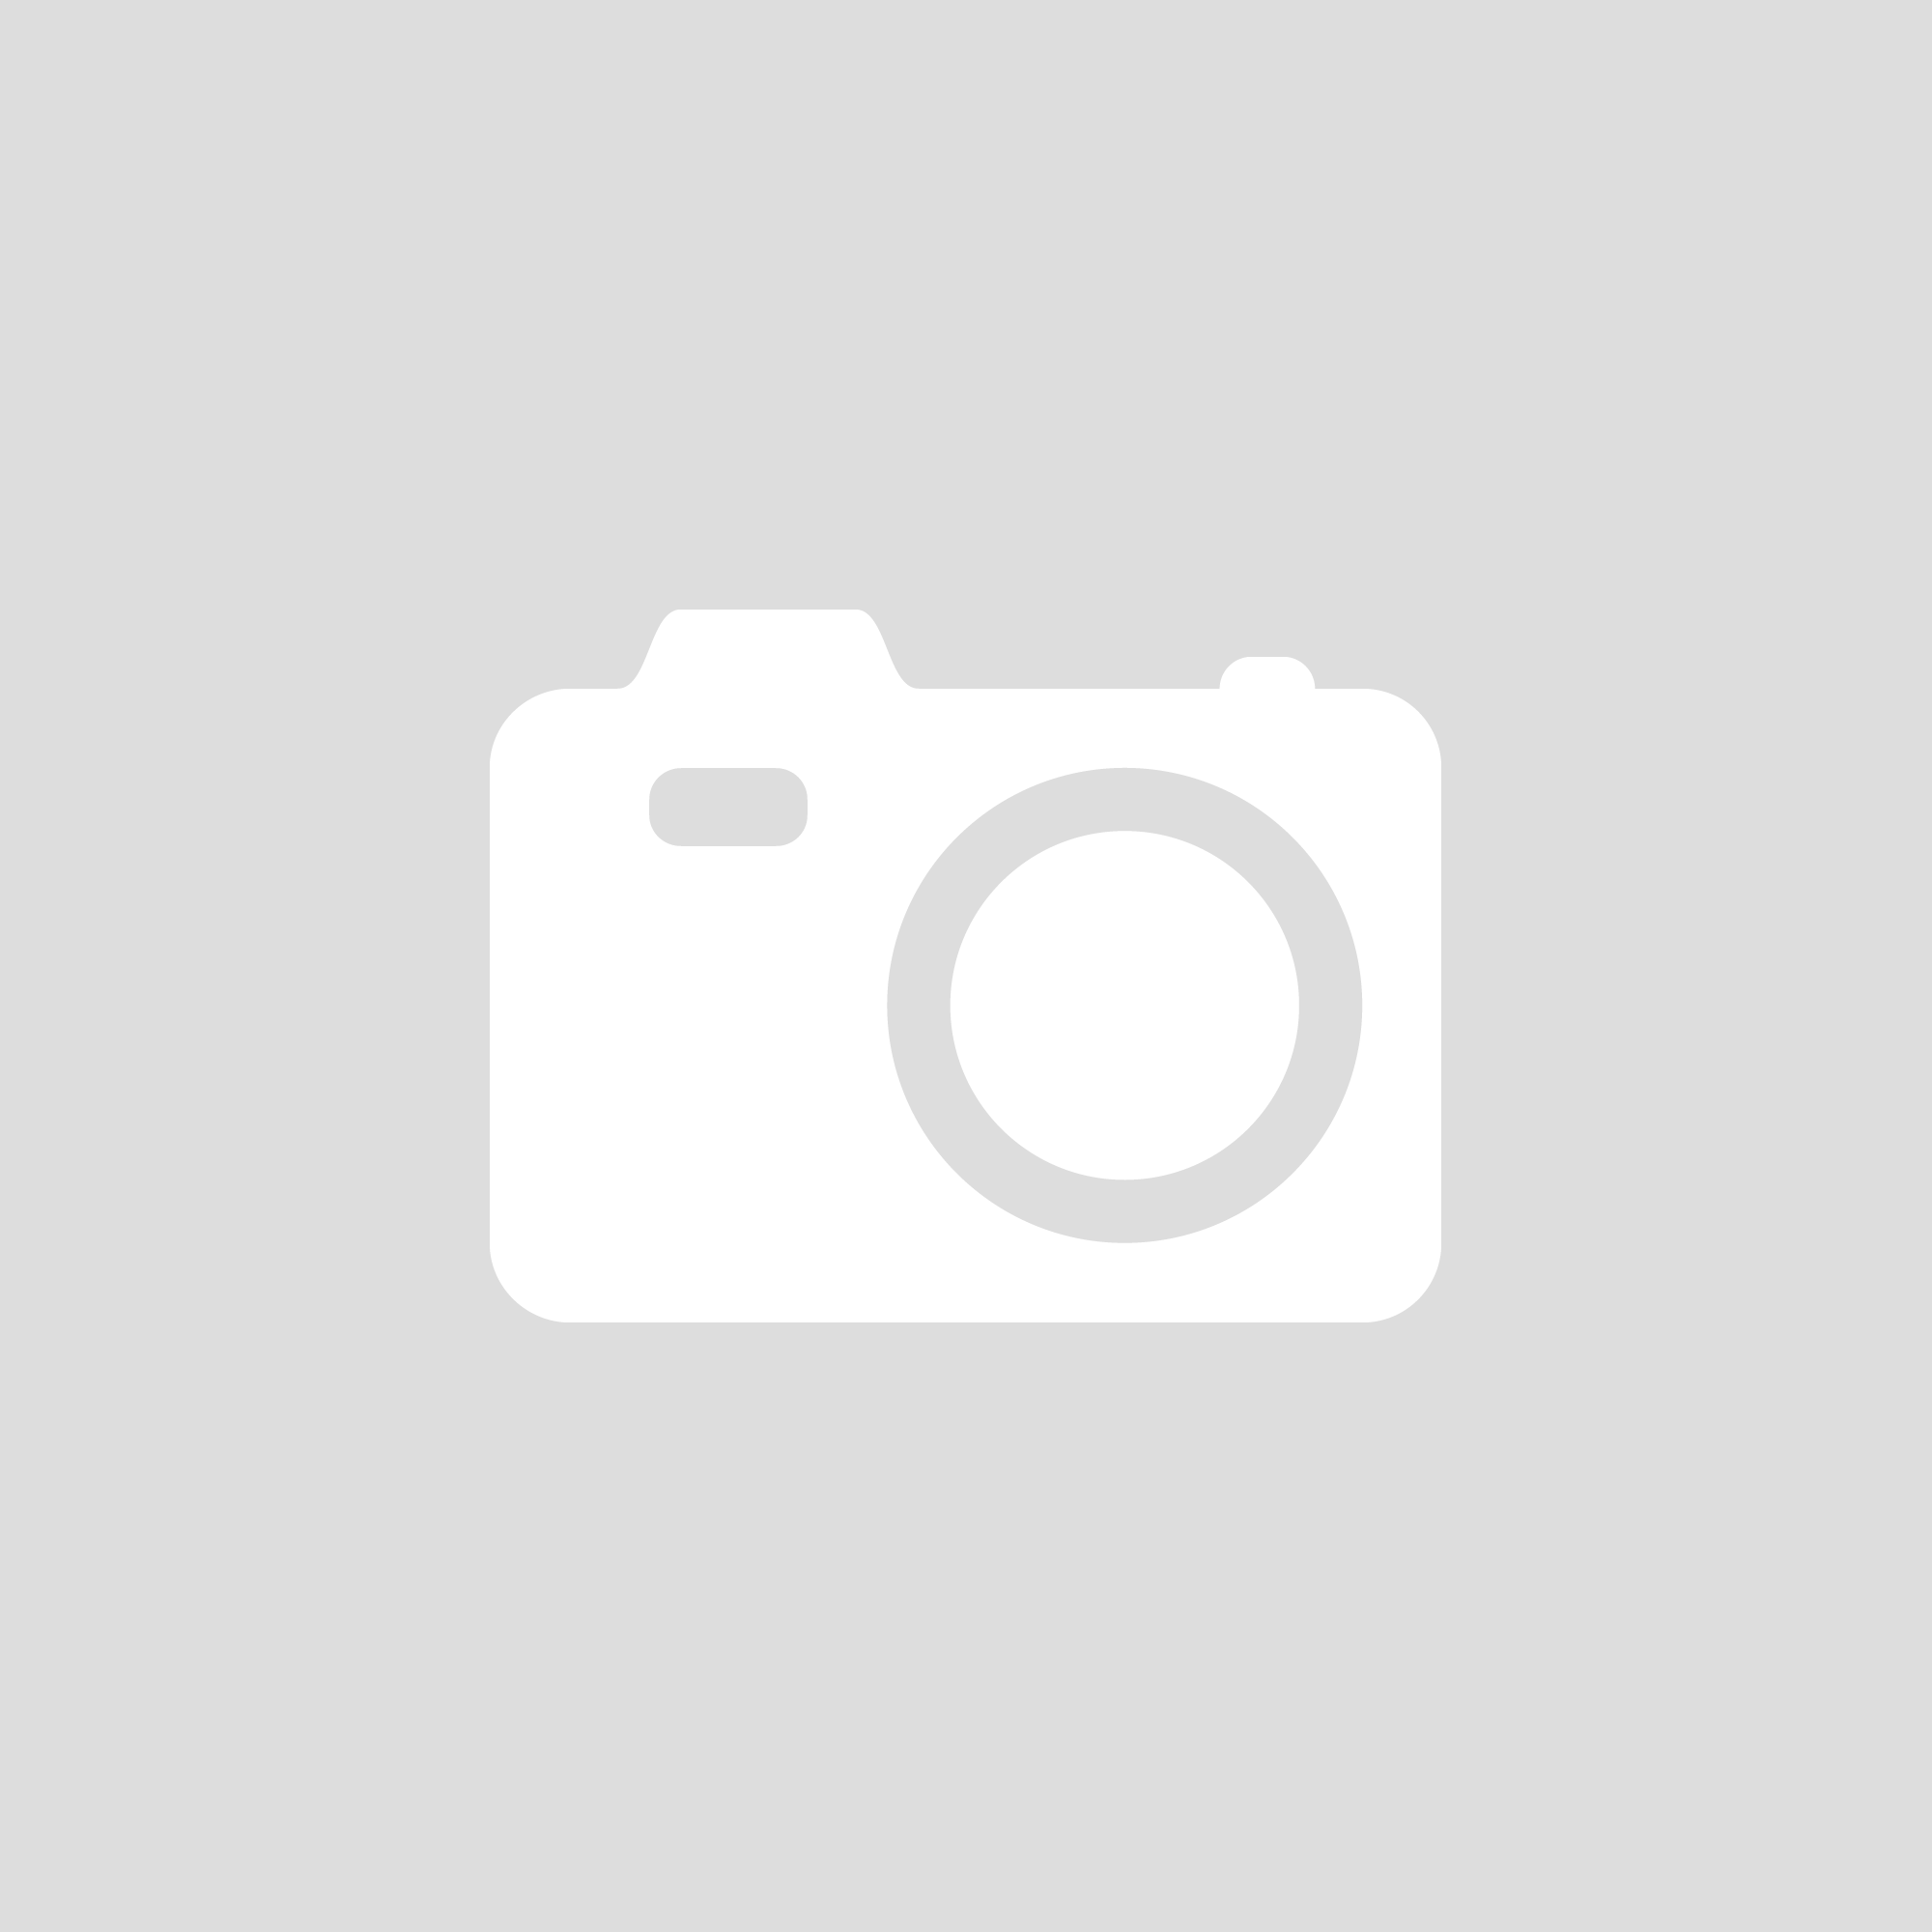 Shaggy Textured Cushion in Black by CIMC